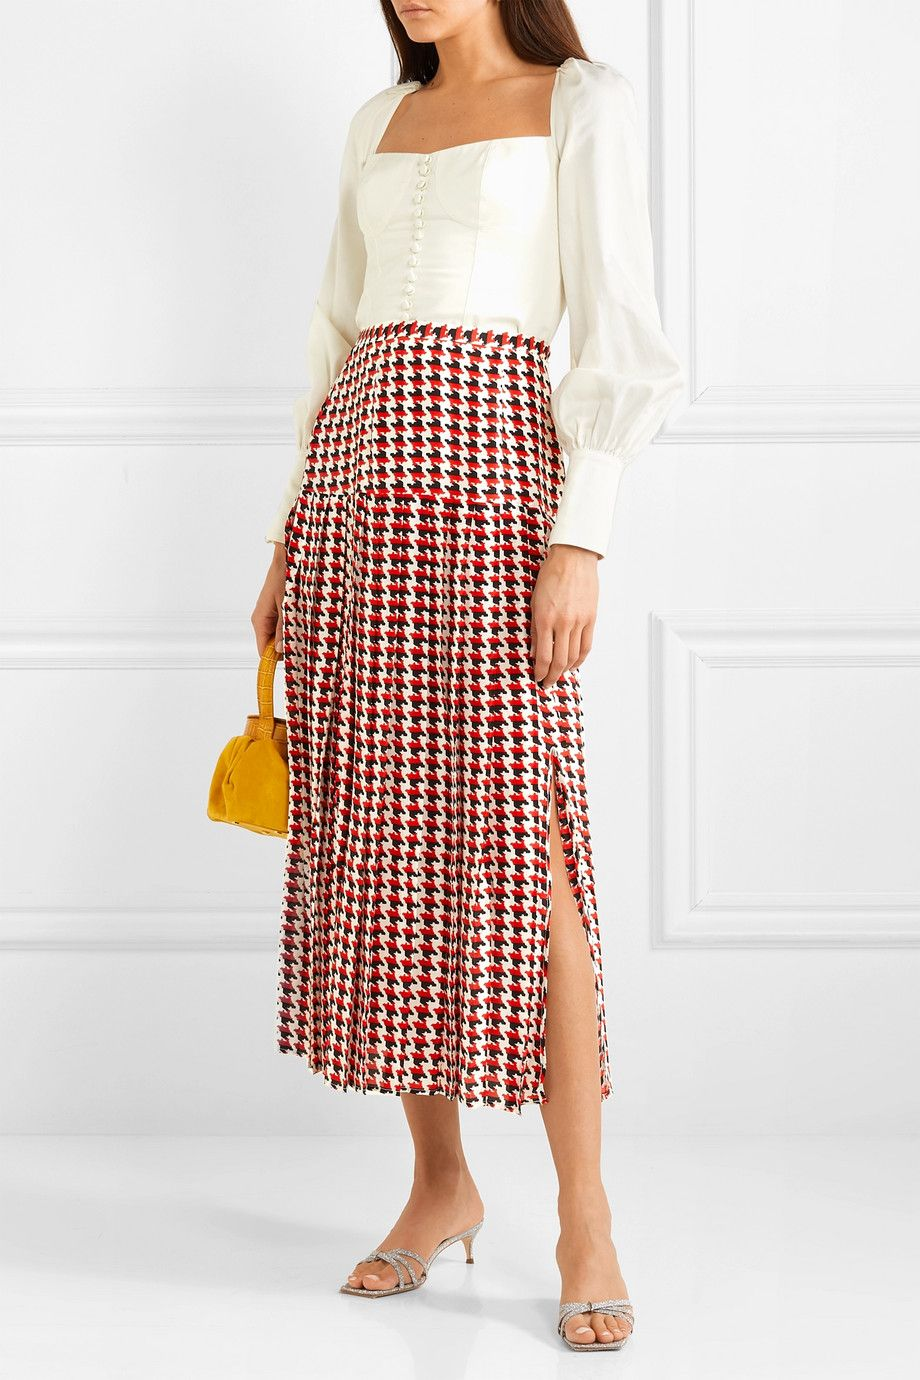 c93f8fa2 RIXO | Tina pleated houndstooth silk crepe de chine midi skirt |  NET-A-PORTER.COM